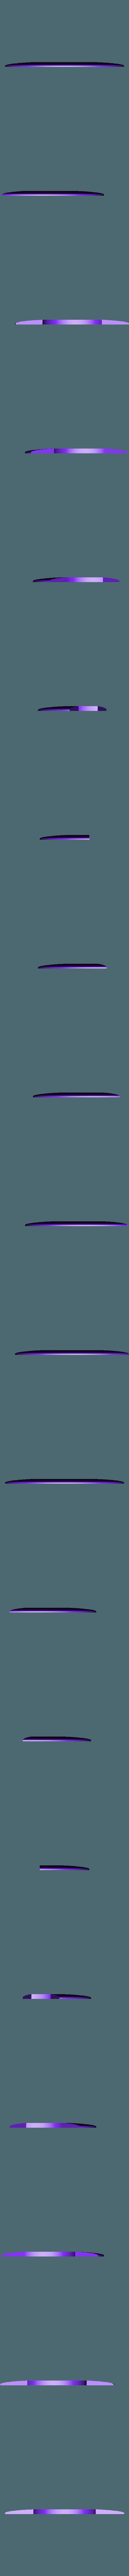 ts_gelb2.stl Download free STL file Minion door spyhole cover • 3D print design, uepsie